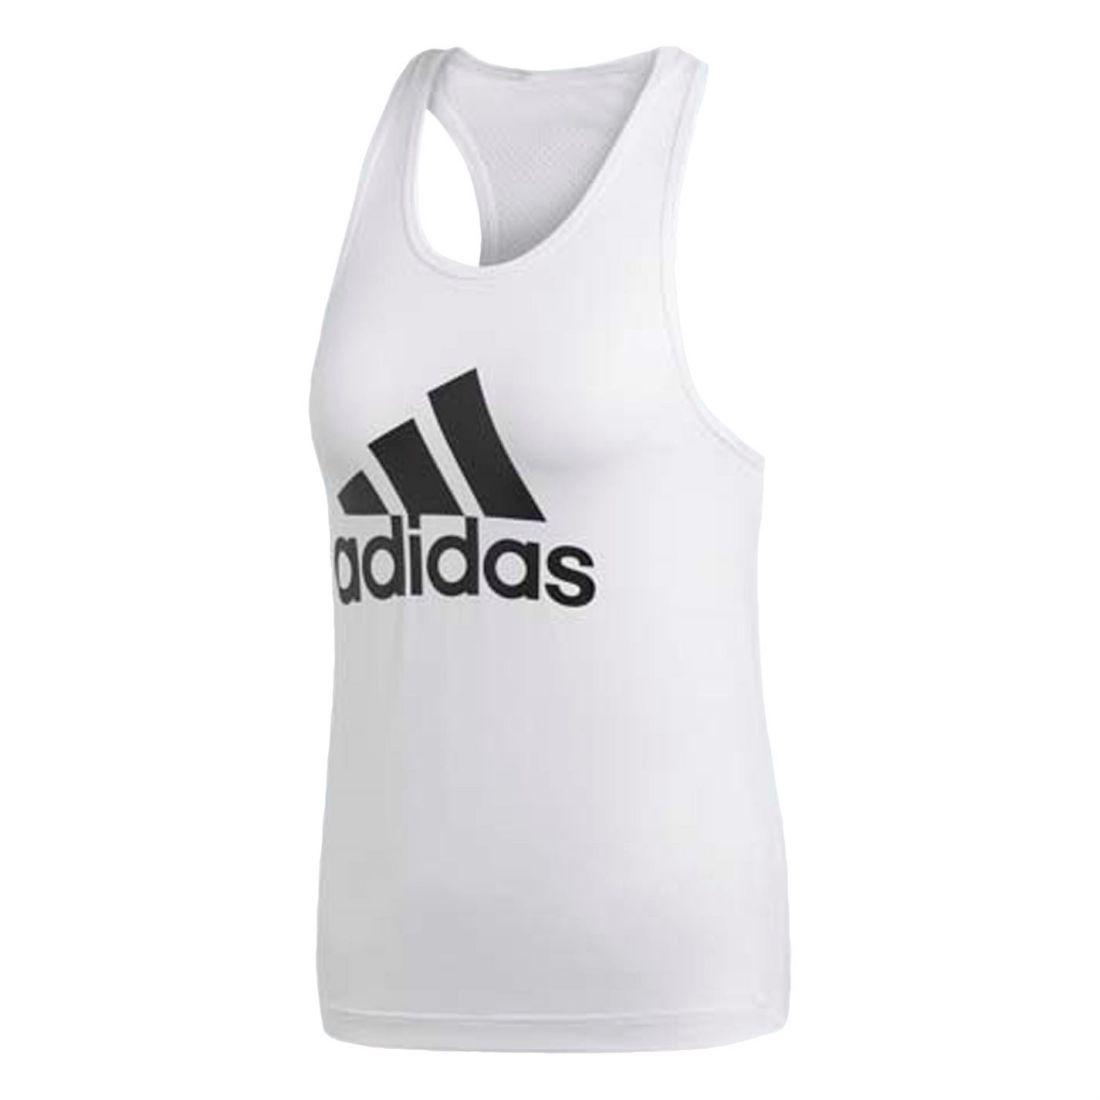 4be903c7c78e adidas Womens D2M Logo Tank Top Performance Vest Crew Neck ...